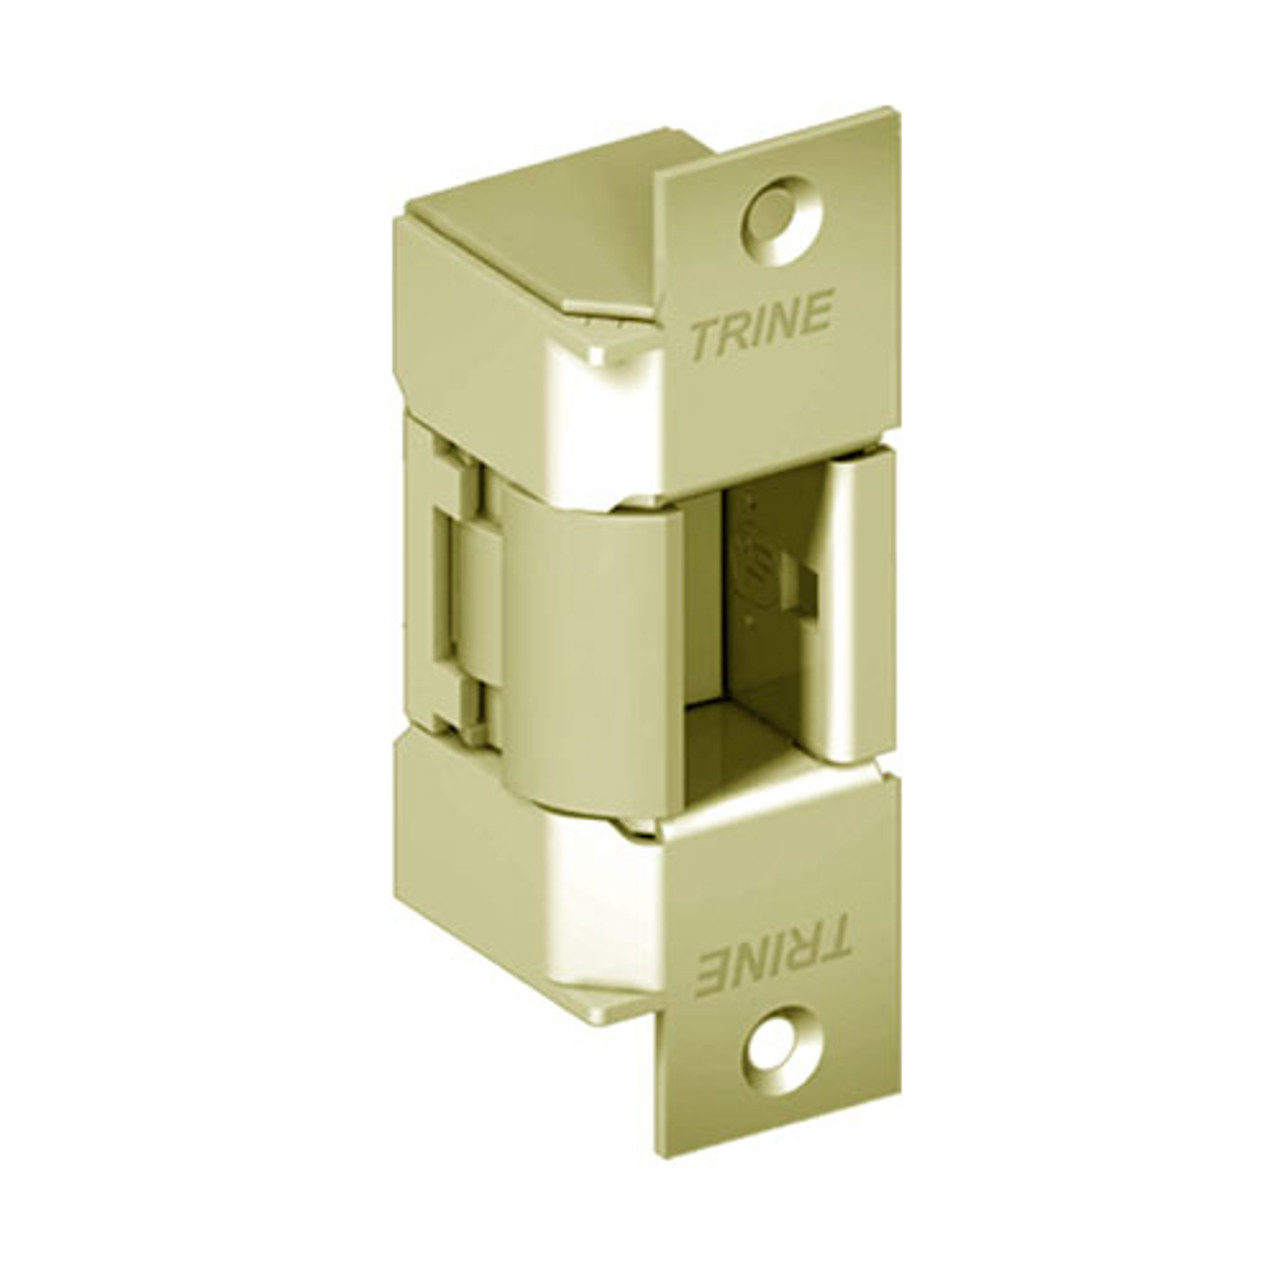 EN400-24AC-US4-RH Trine EN Series Outdoor Electric Strikes Solution in Satin Brass Finish